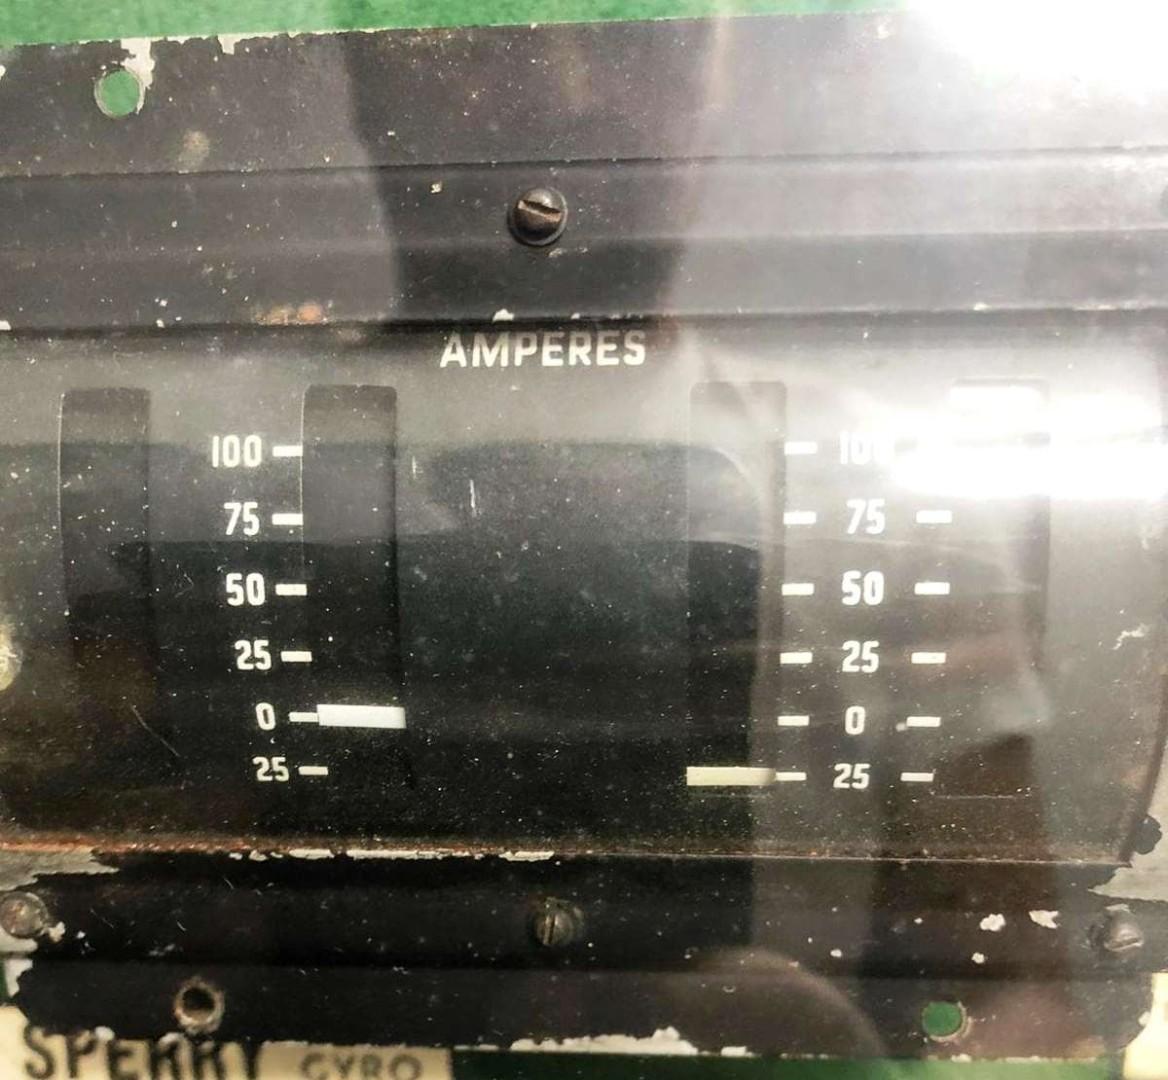 Amperes panel.jpg